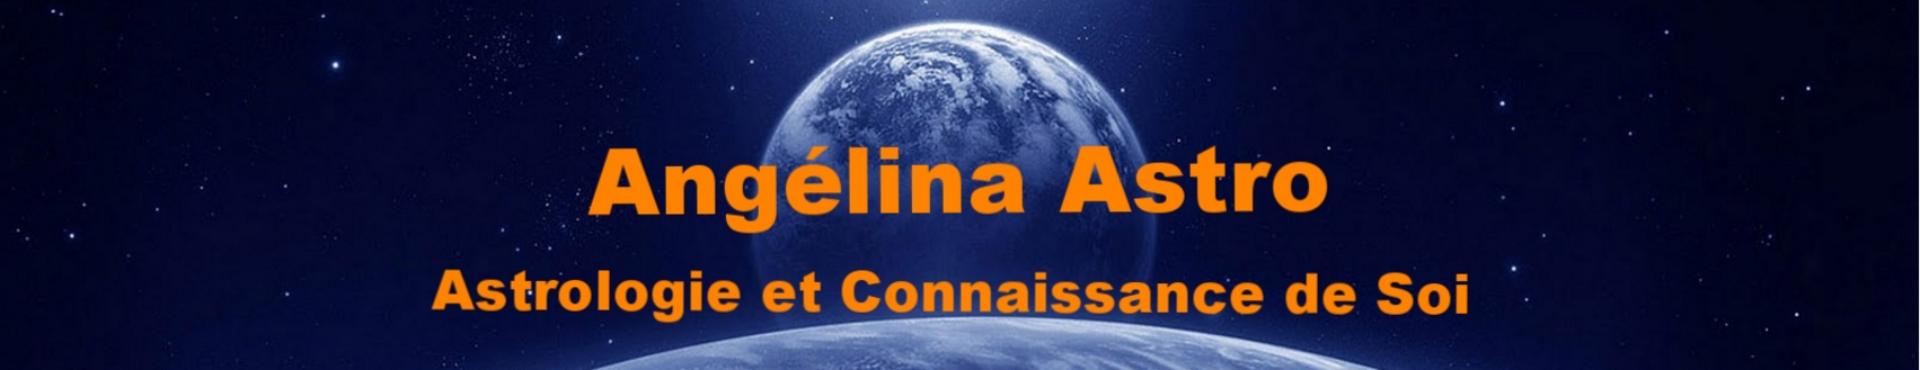 Angélina Astro